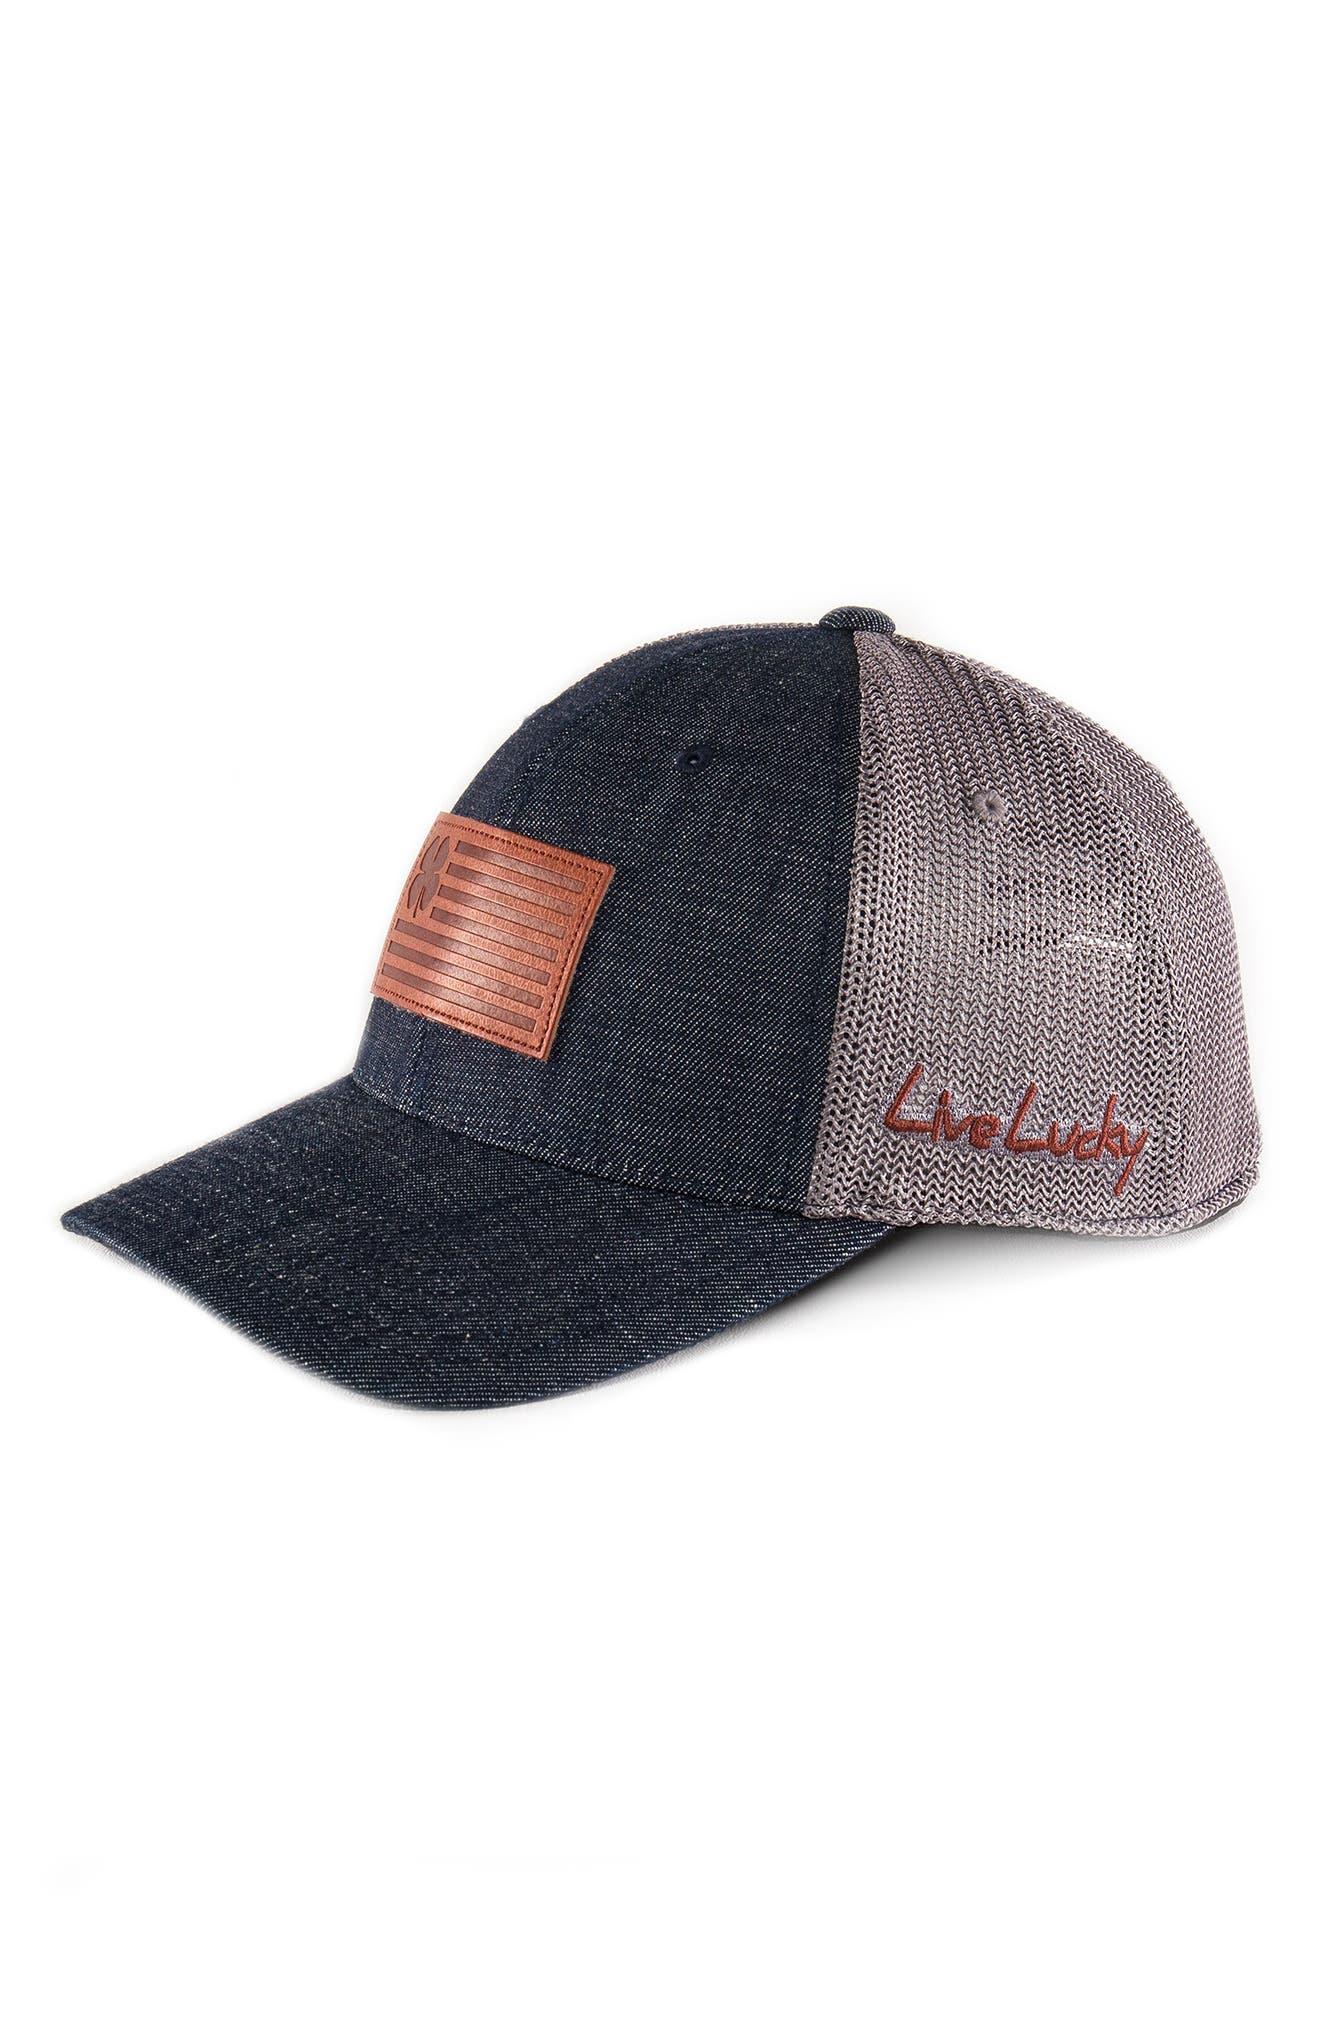 Clover Nation Trucker Hat